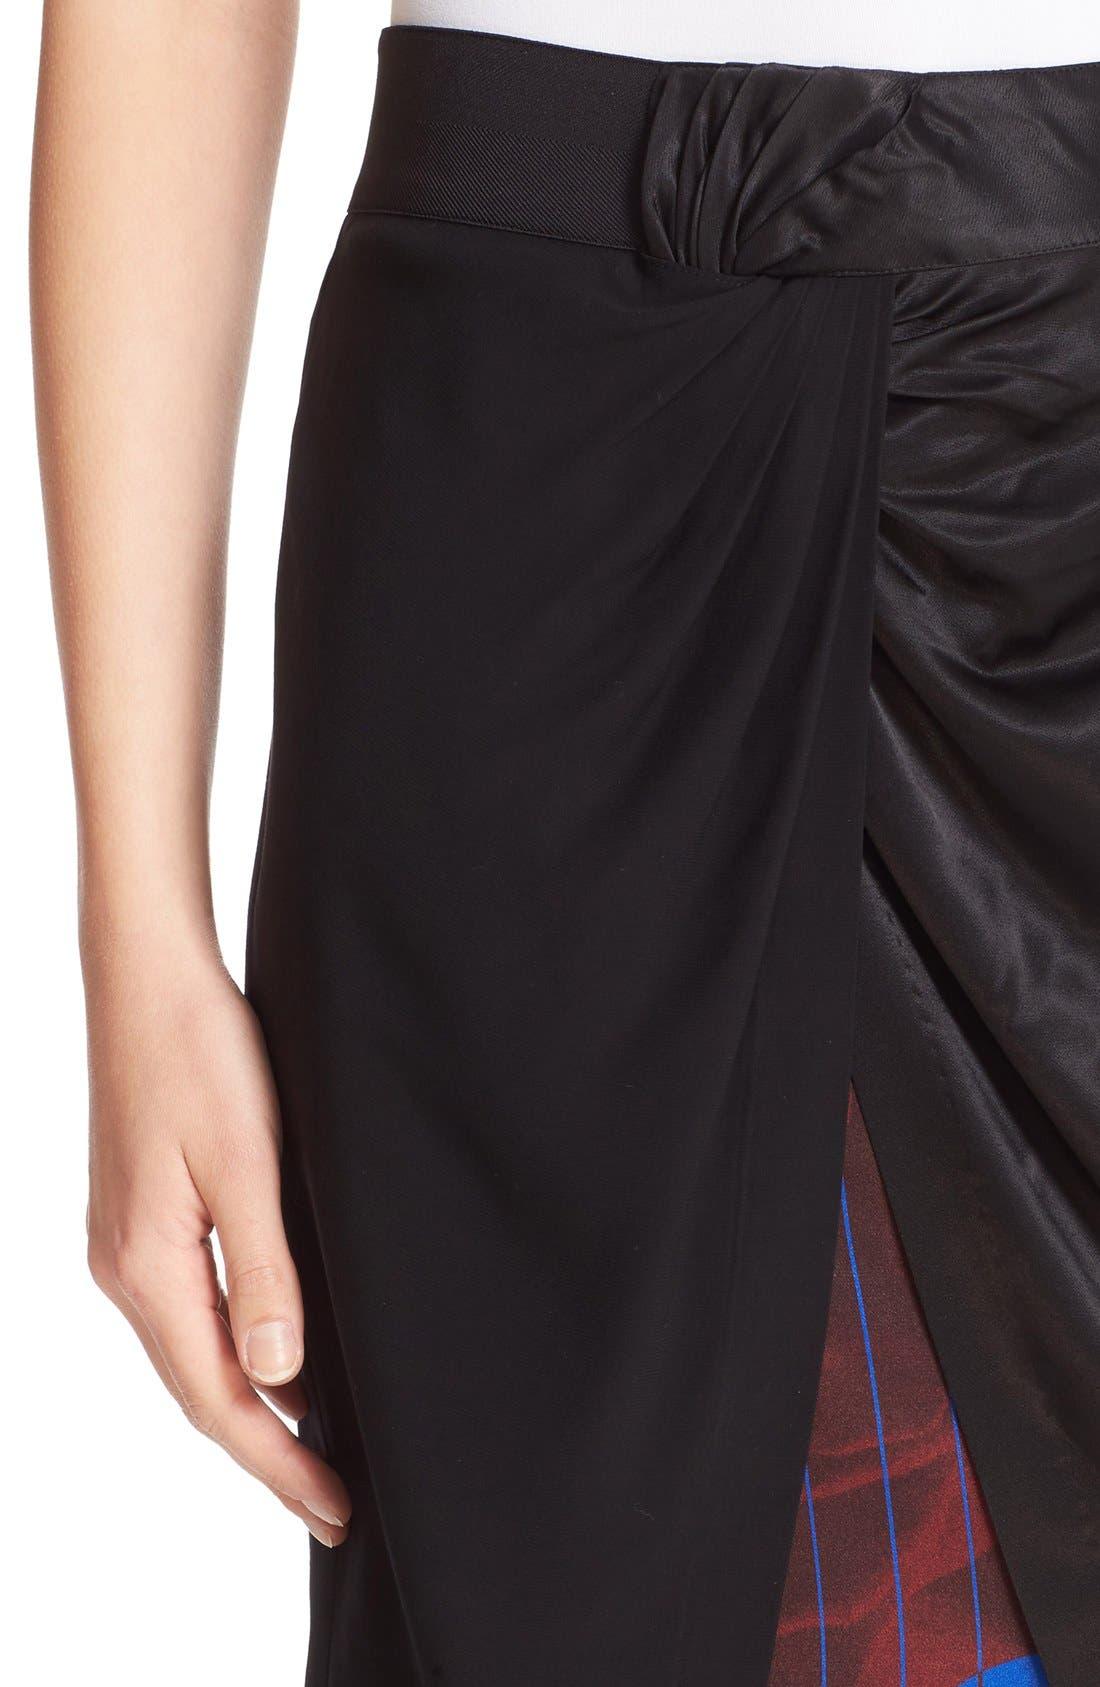 Asymmetrical Mixed Media Skirt,                             Alternate thumbnail 6, color,                             001